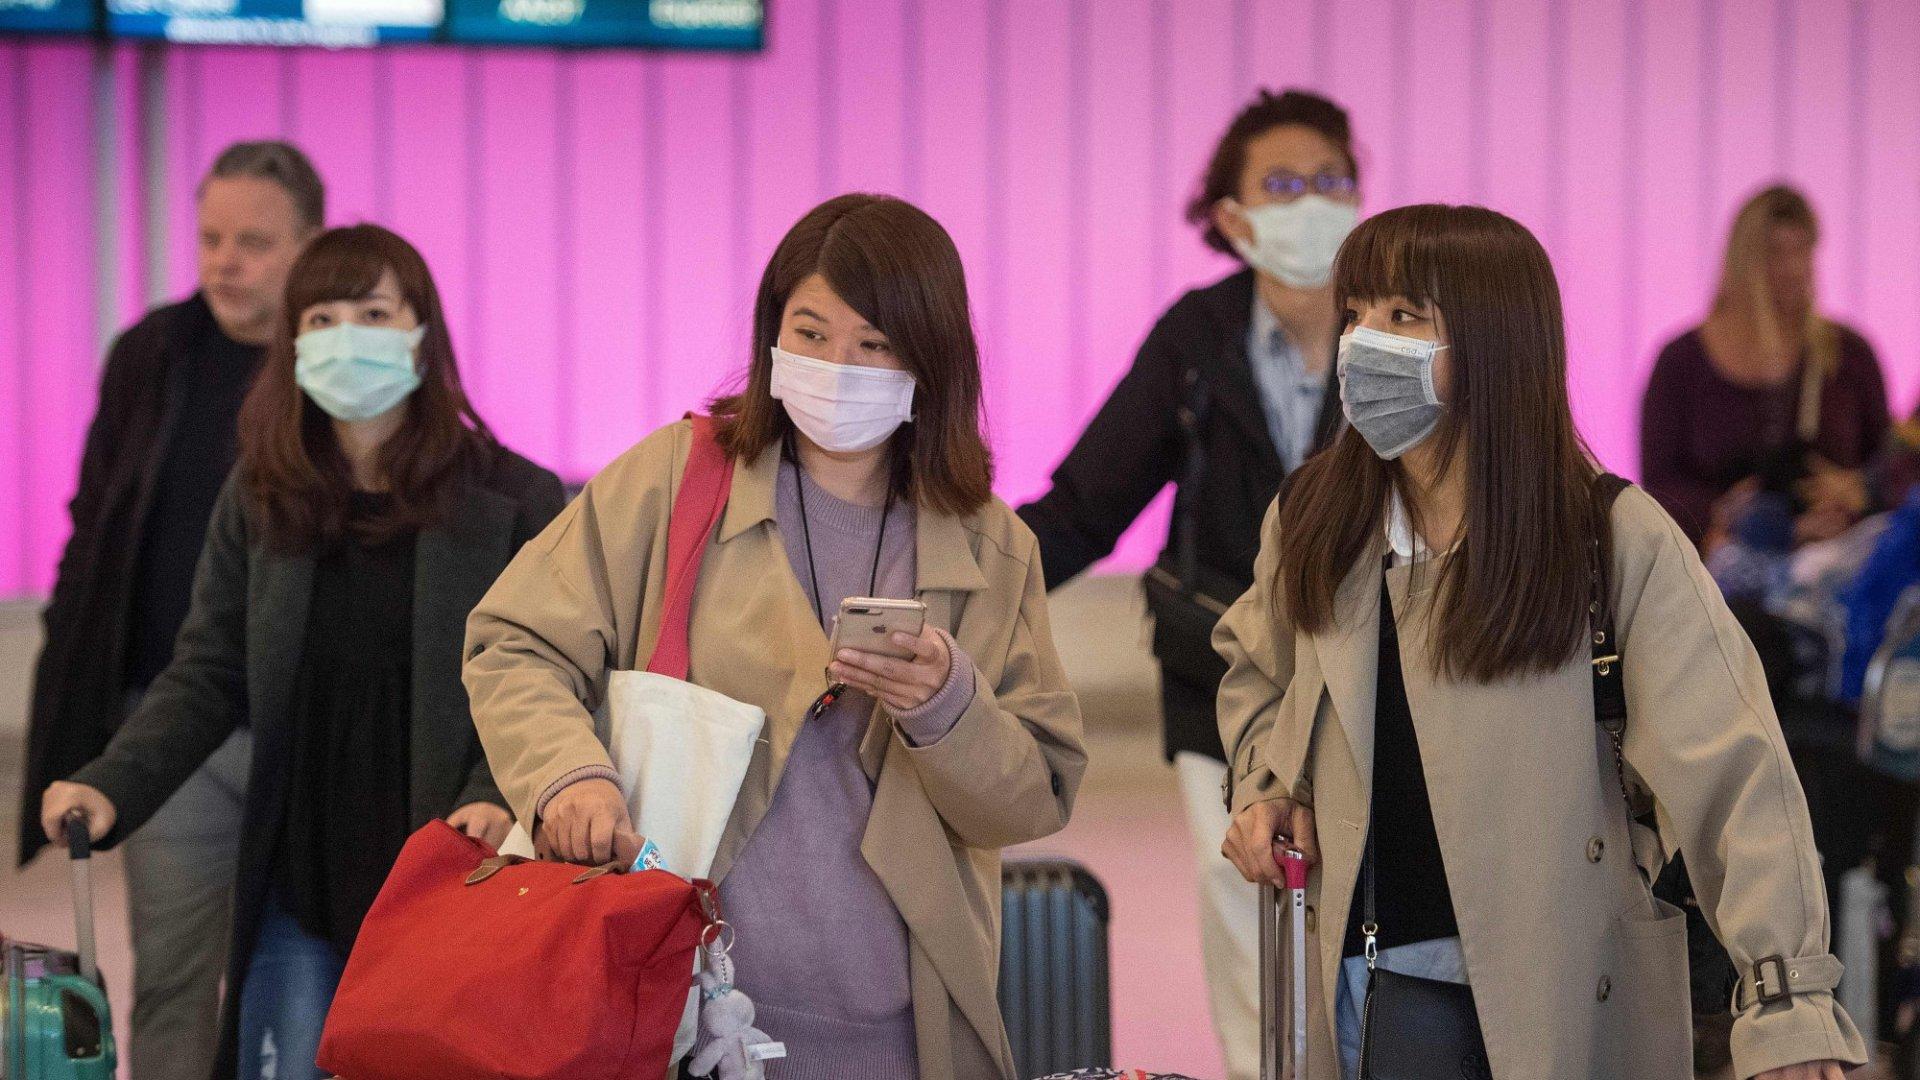 4 Simple Precautions That Will Help You Avoid the Coronavirus